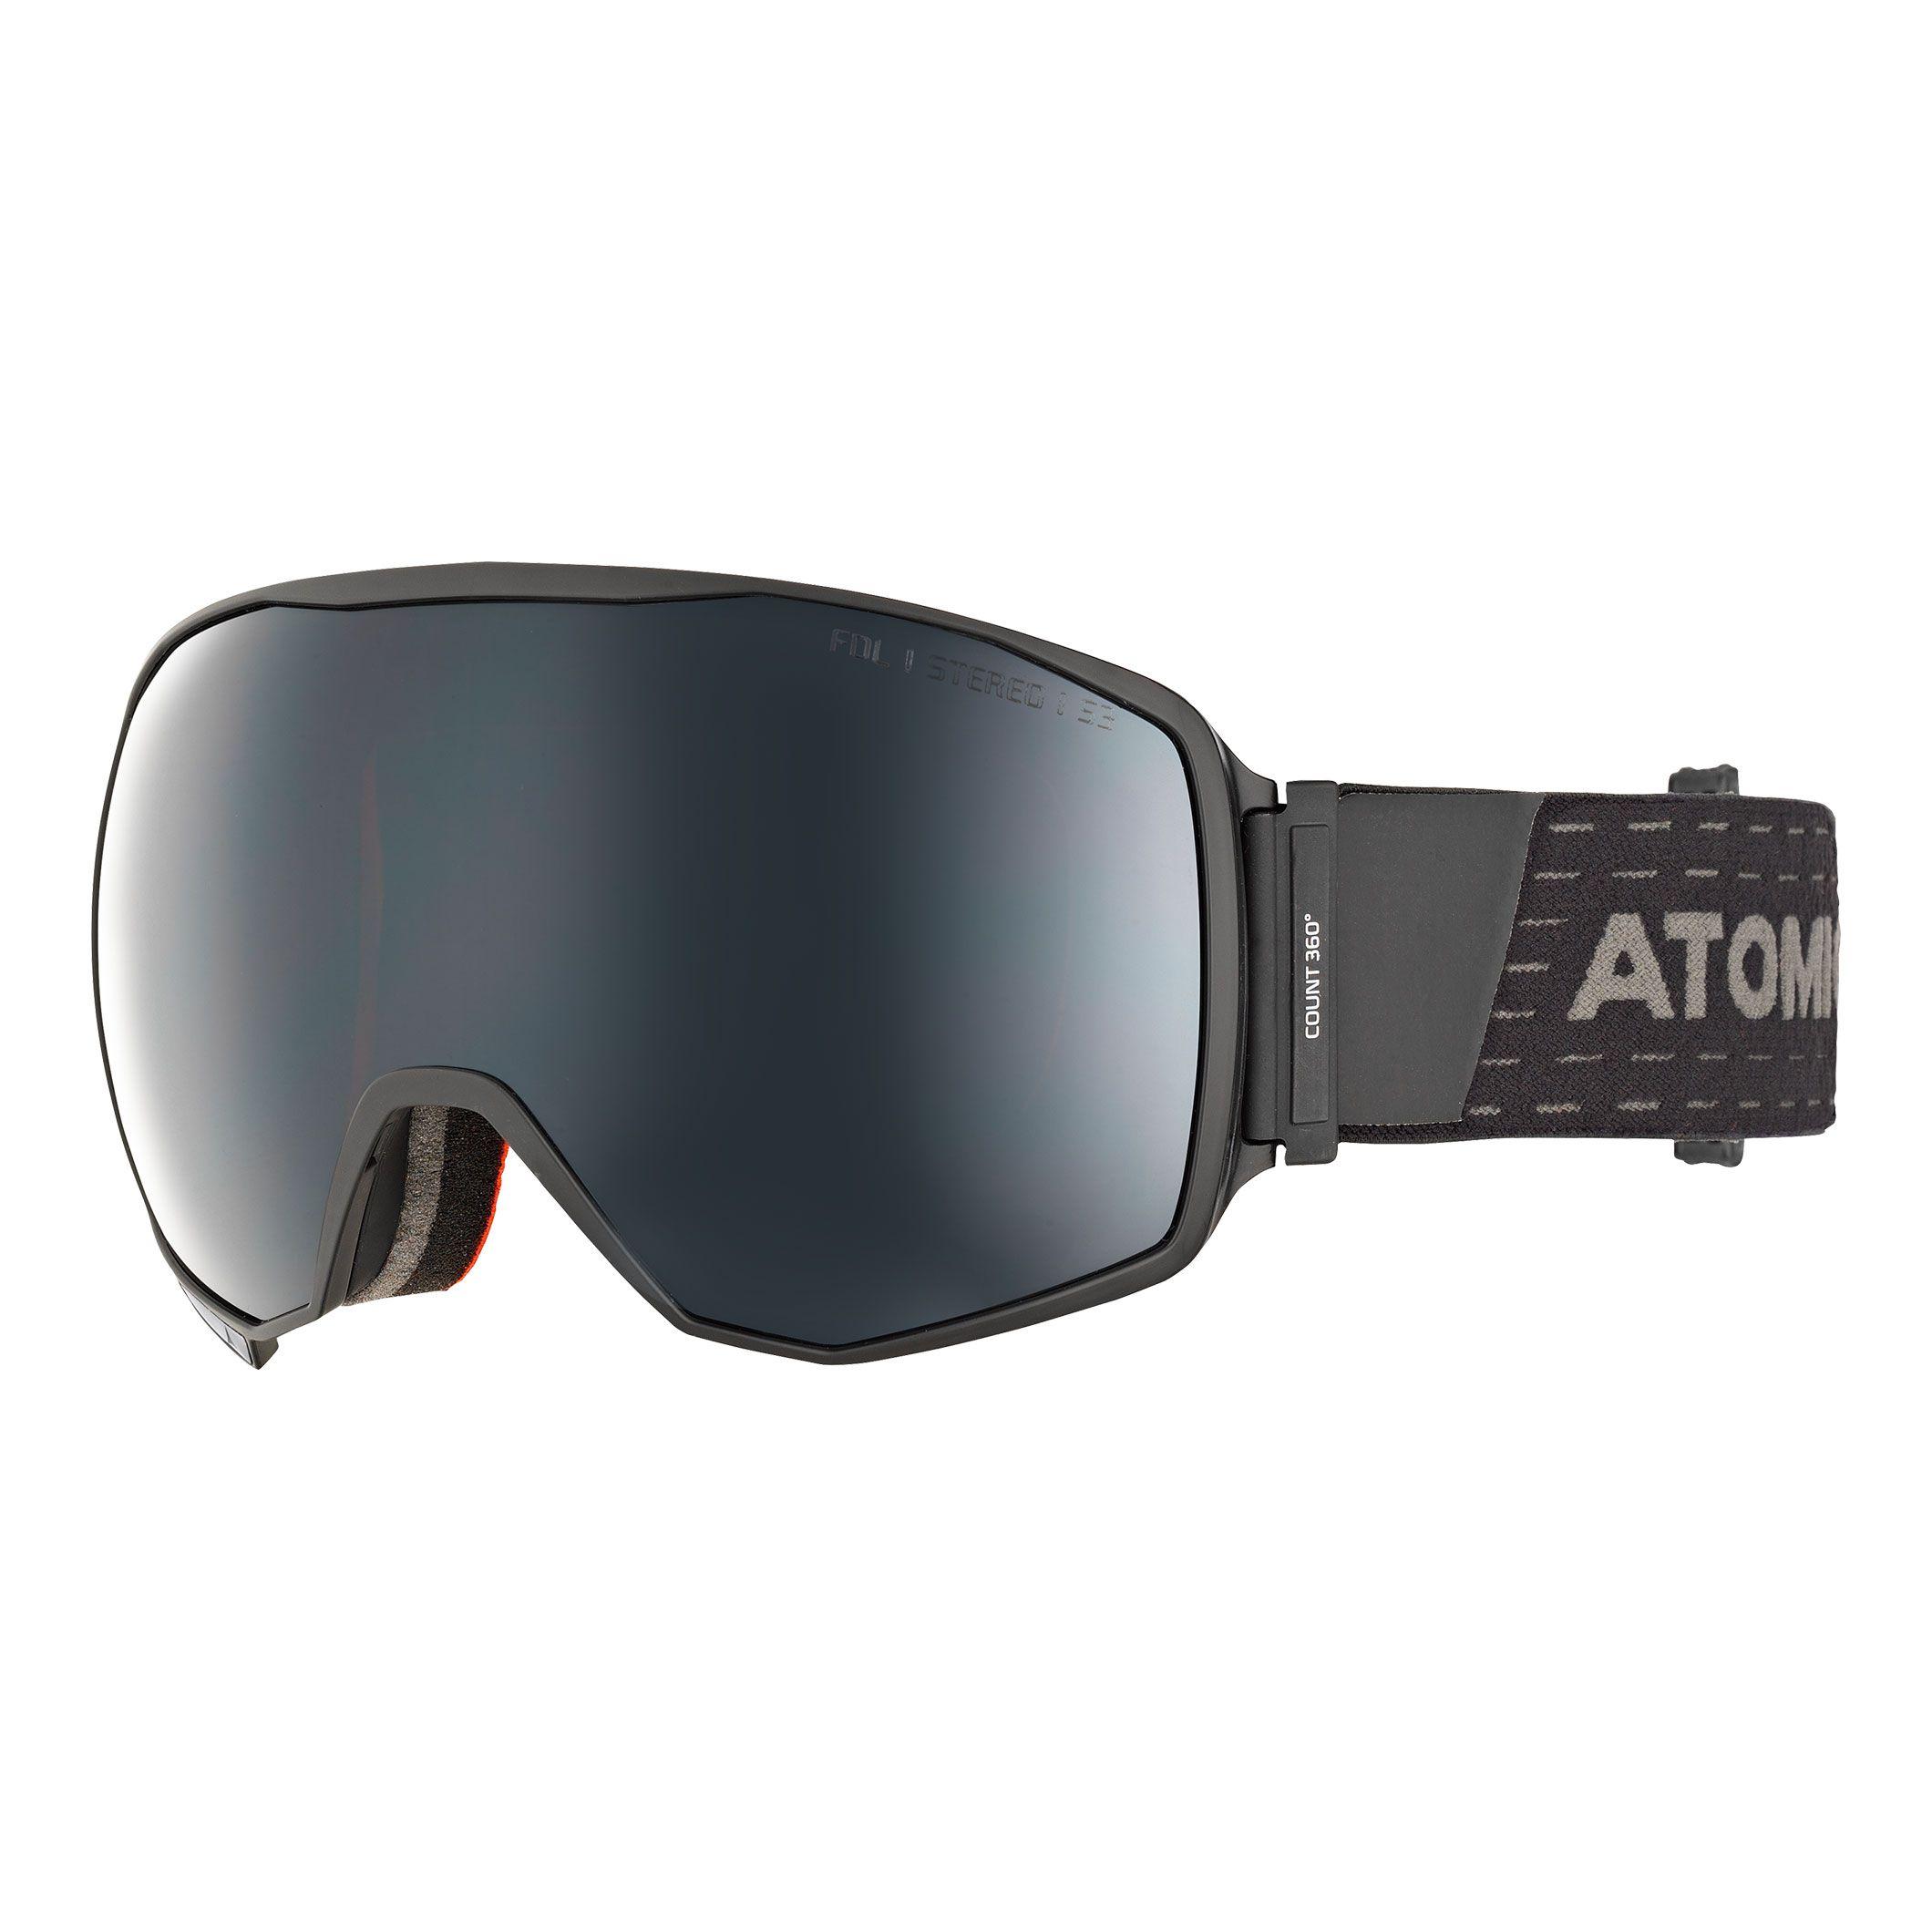 17683e832dc The 8 Best Over-Glasses Ski   Snowboard Goggles of 2019